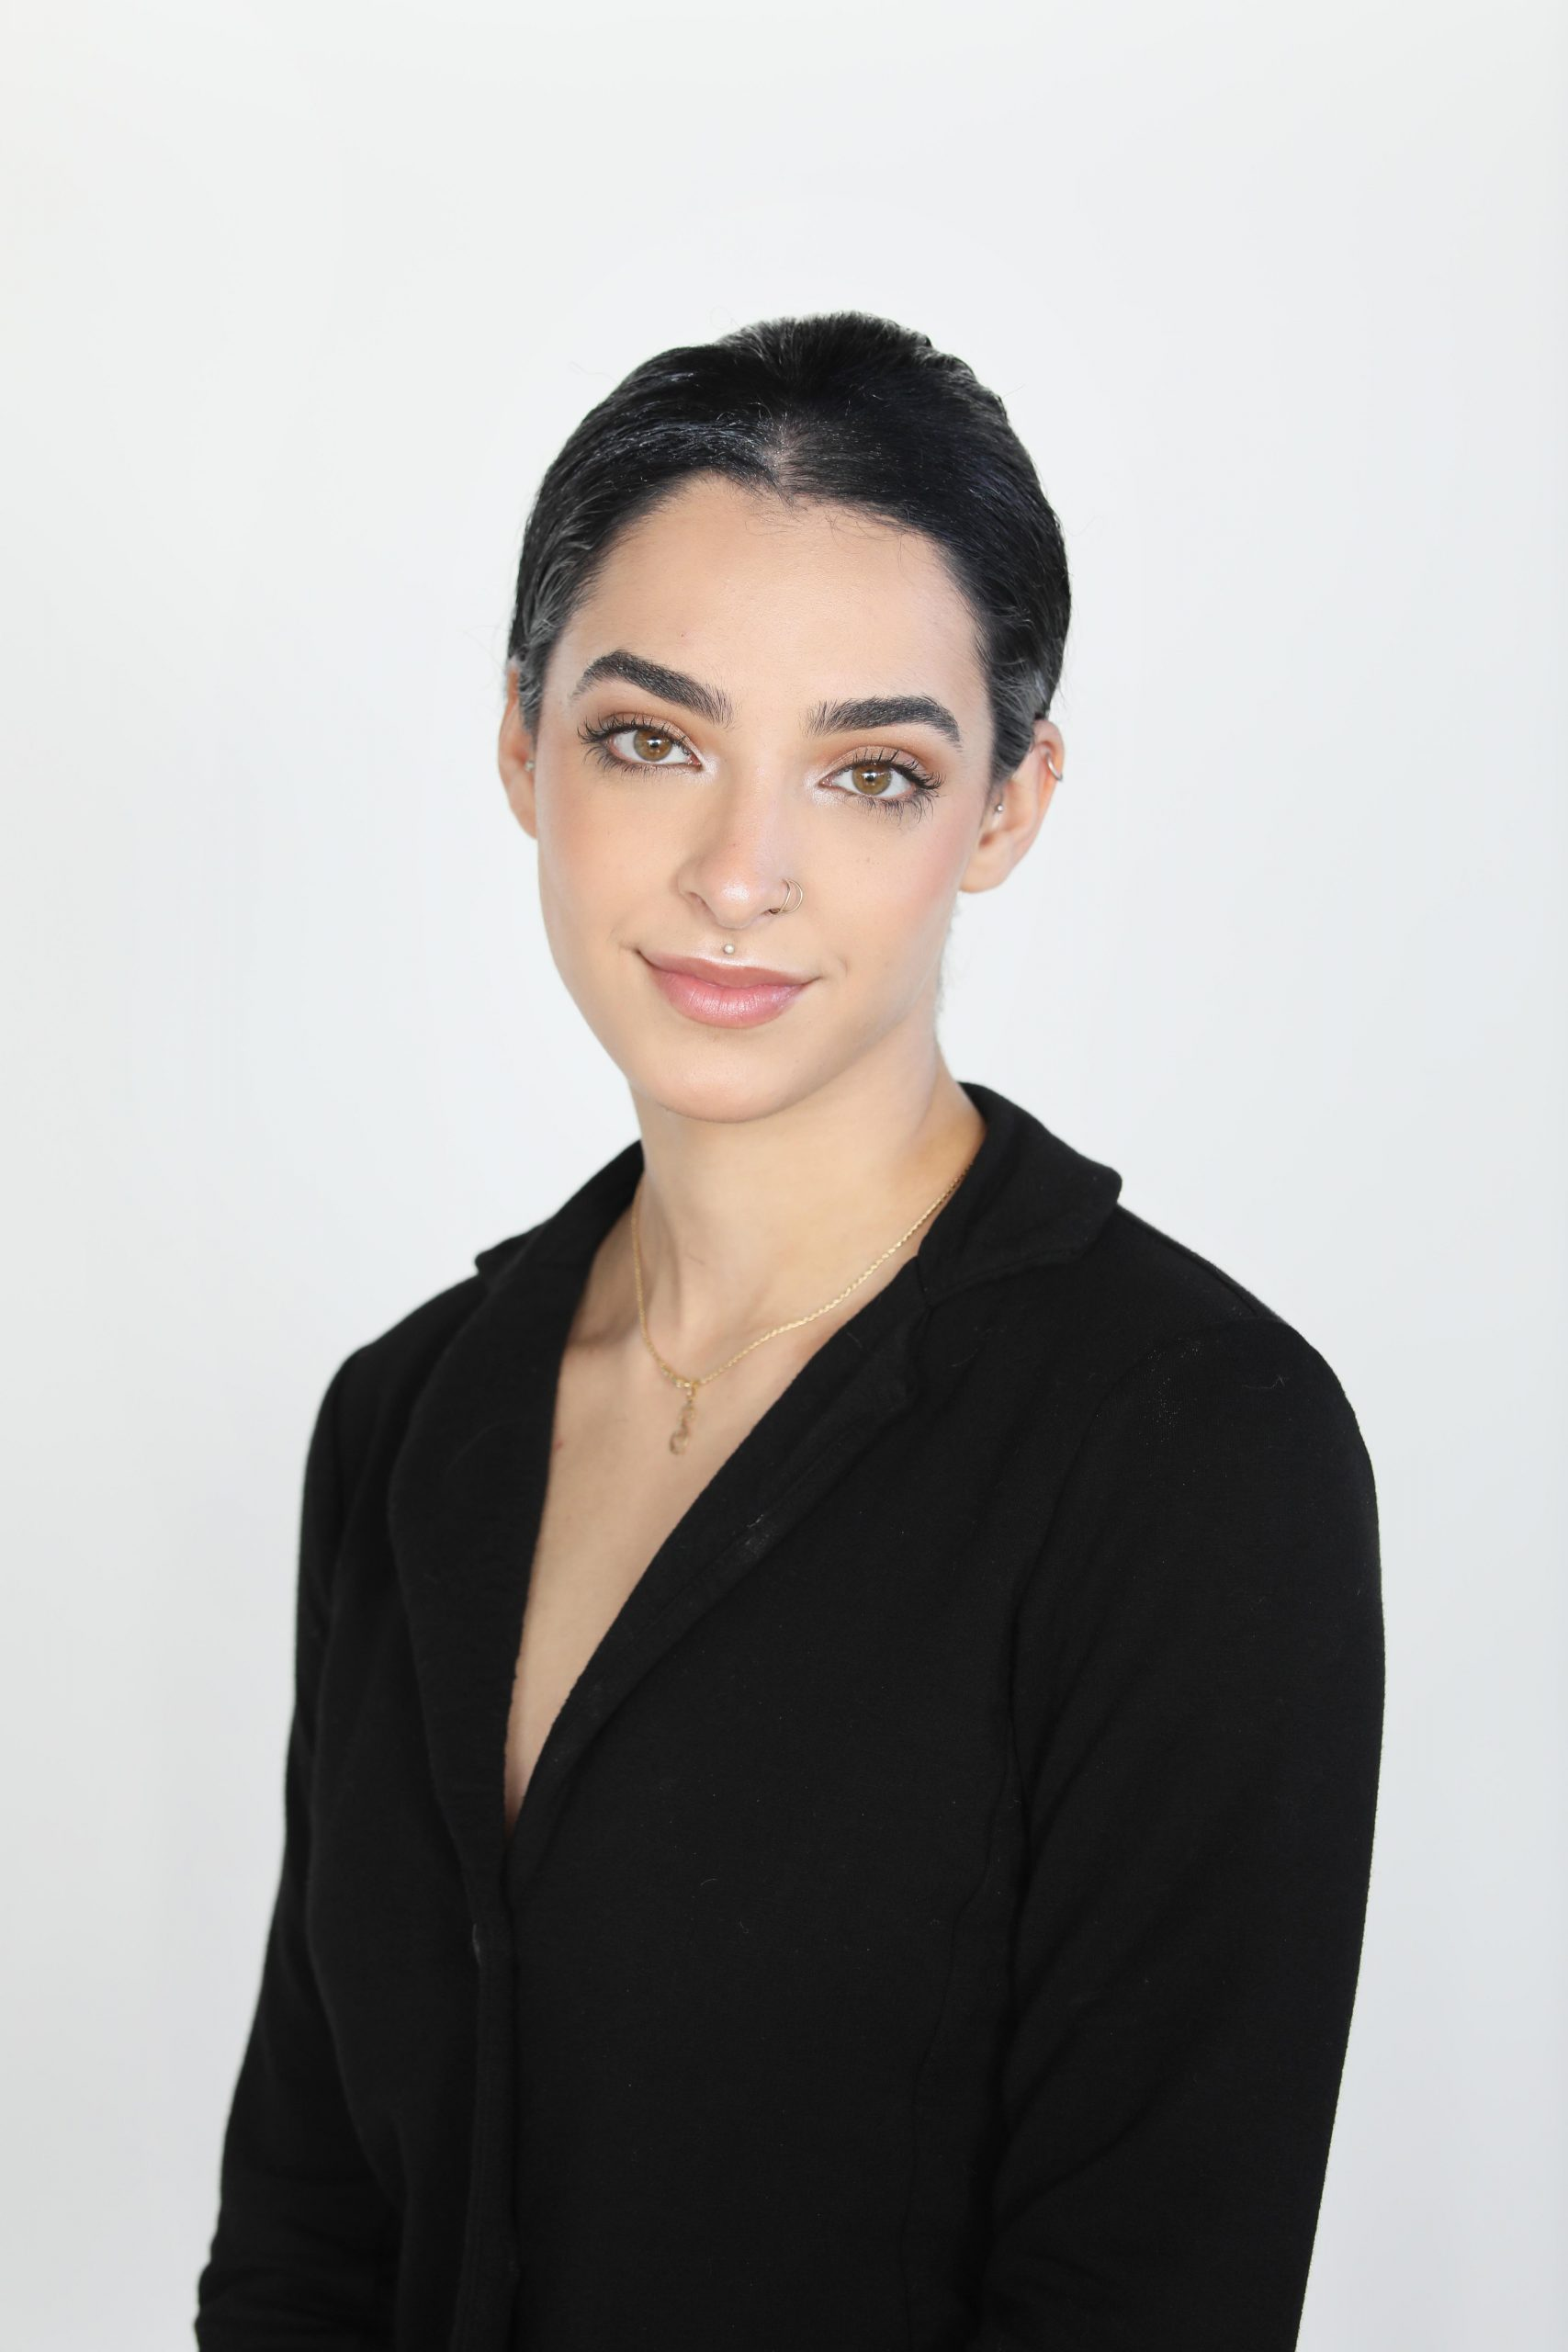 Sophia Trecartin